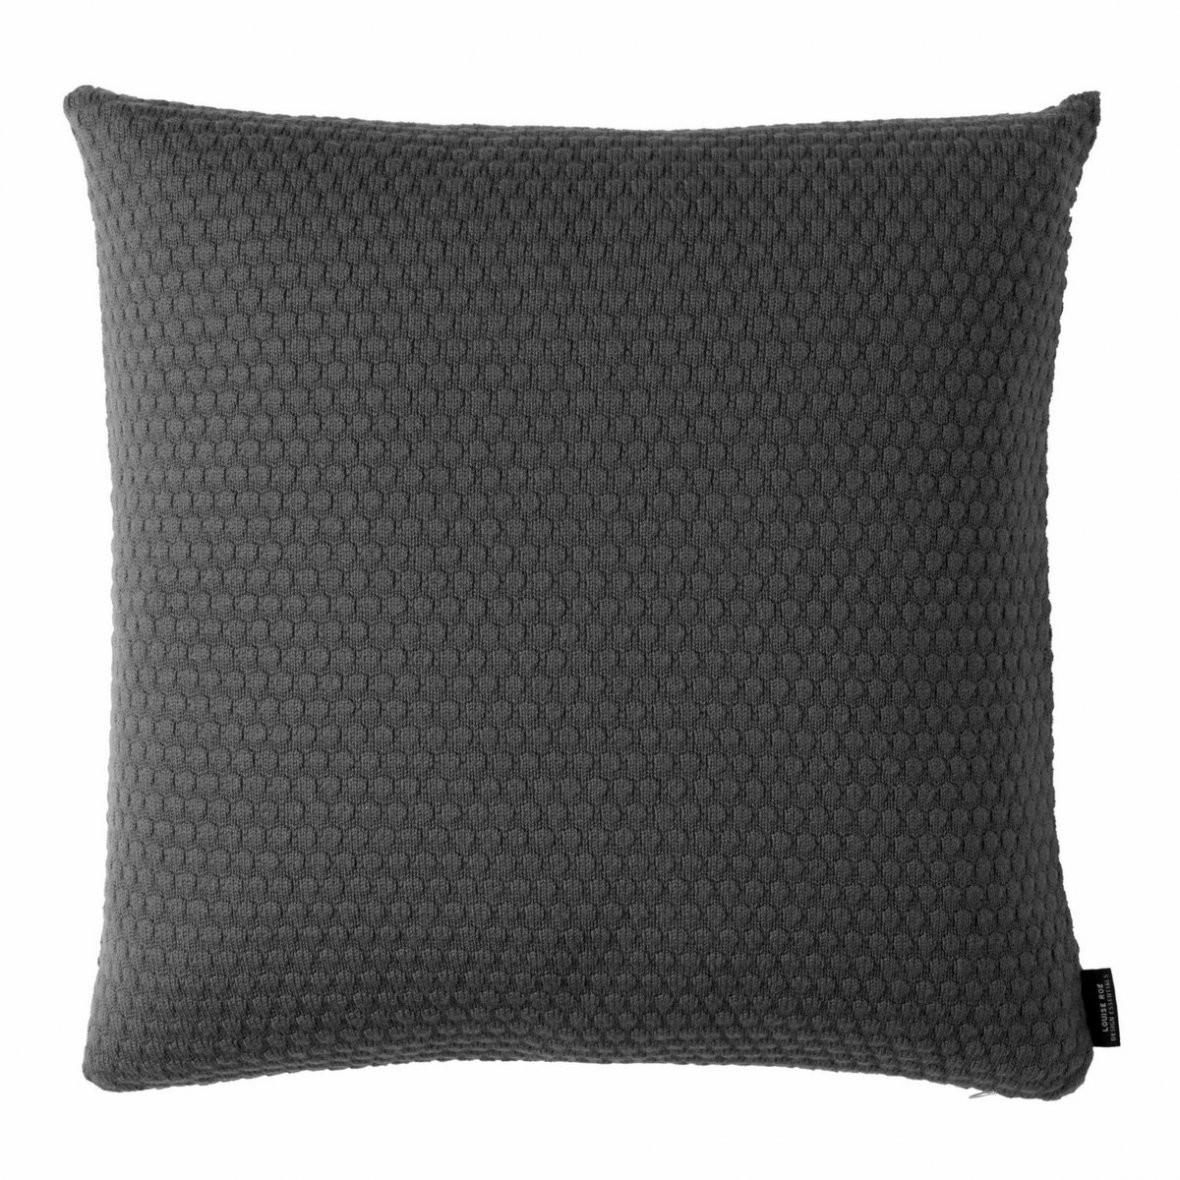 Image of   Louise Roe Sailor Knit Cushion